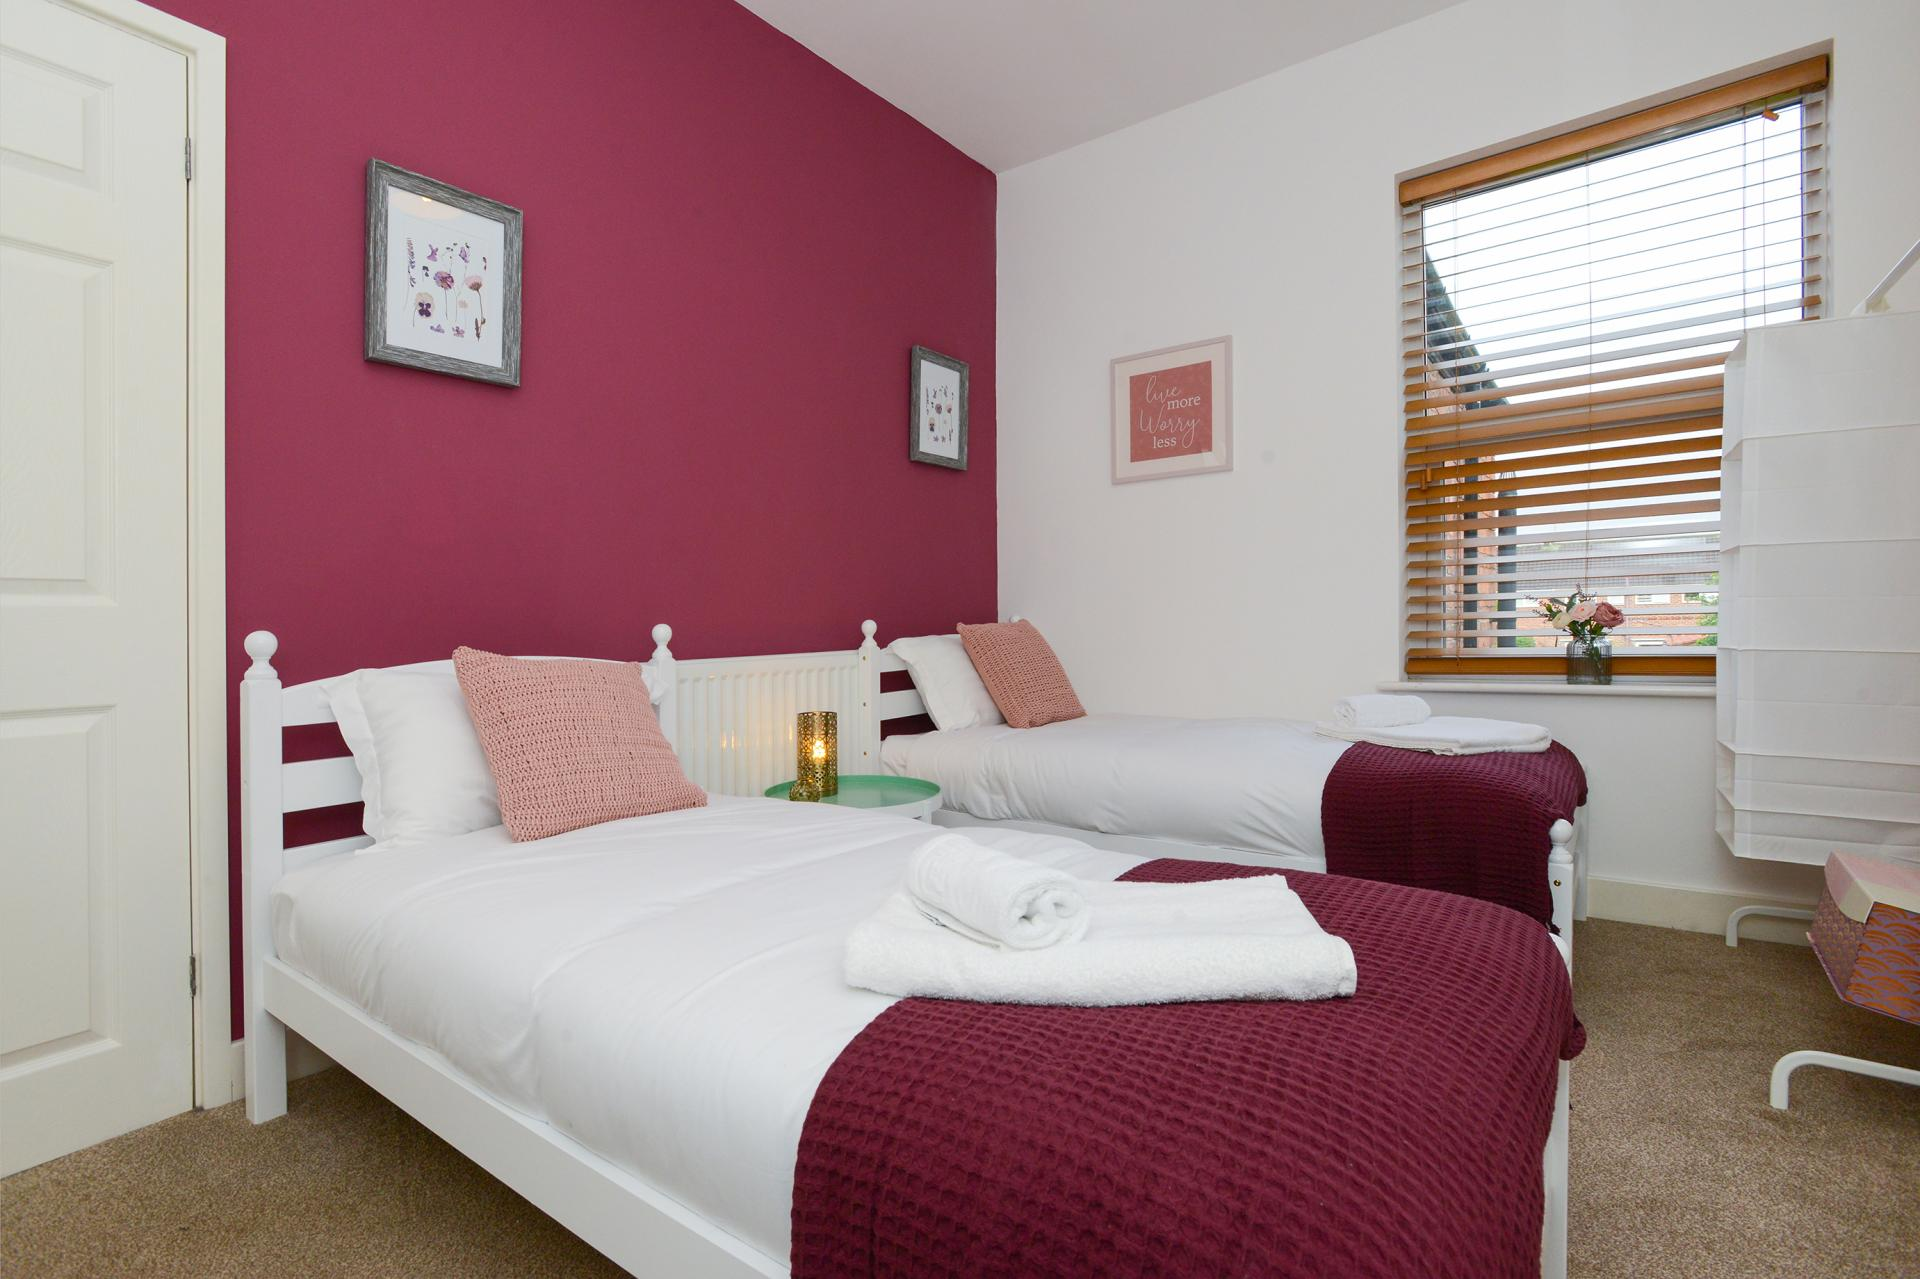 Bedroom at Beeston House, Beeston, Nottingham - Citybase Apartments